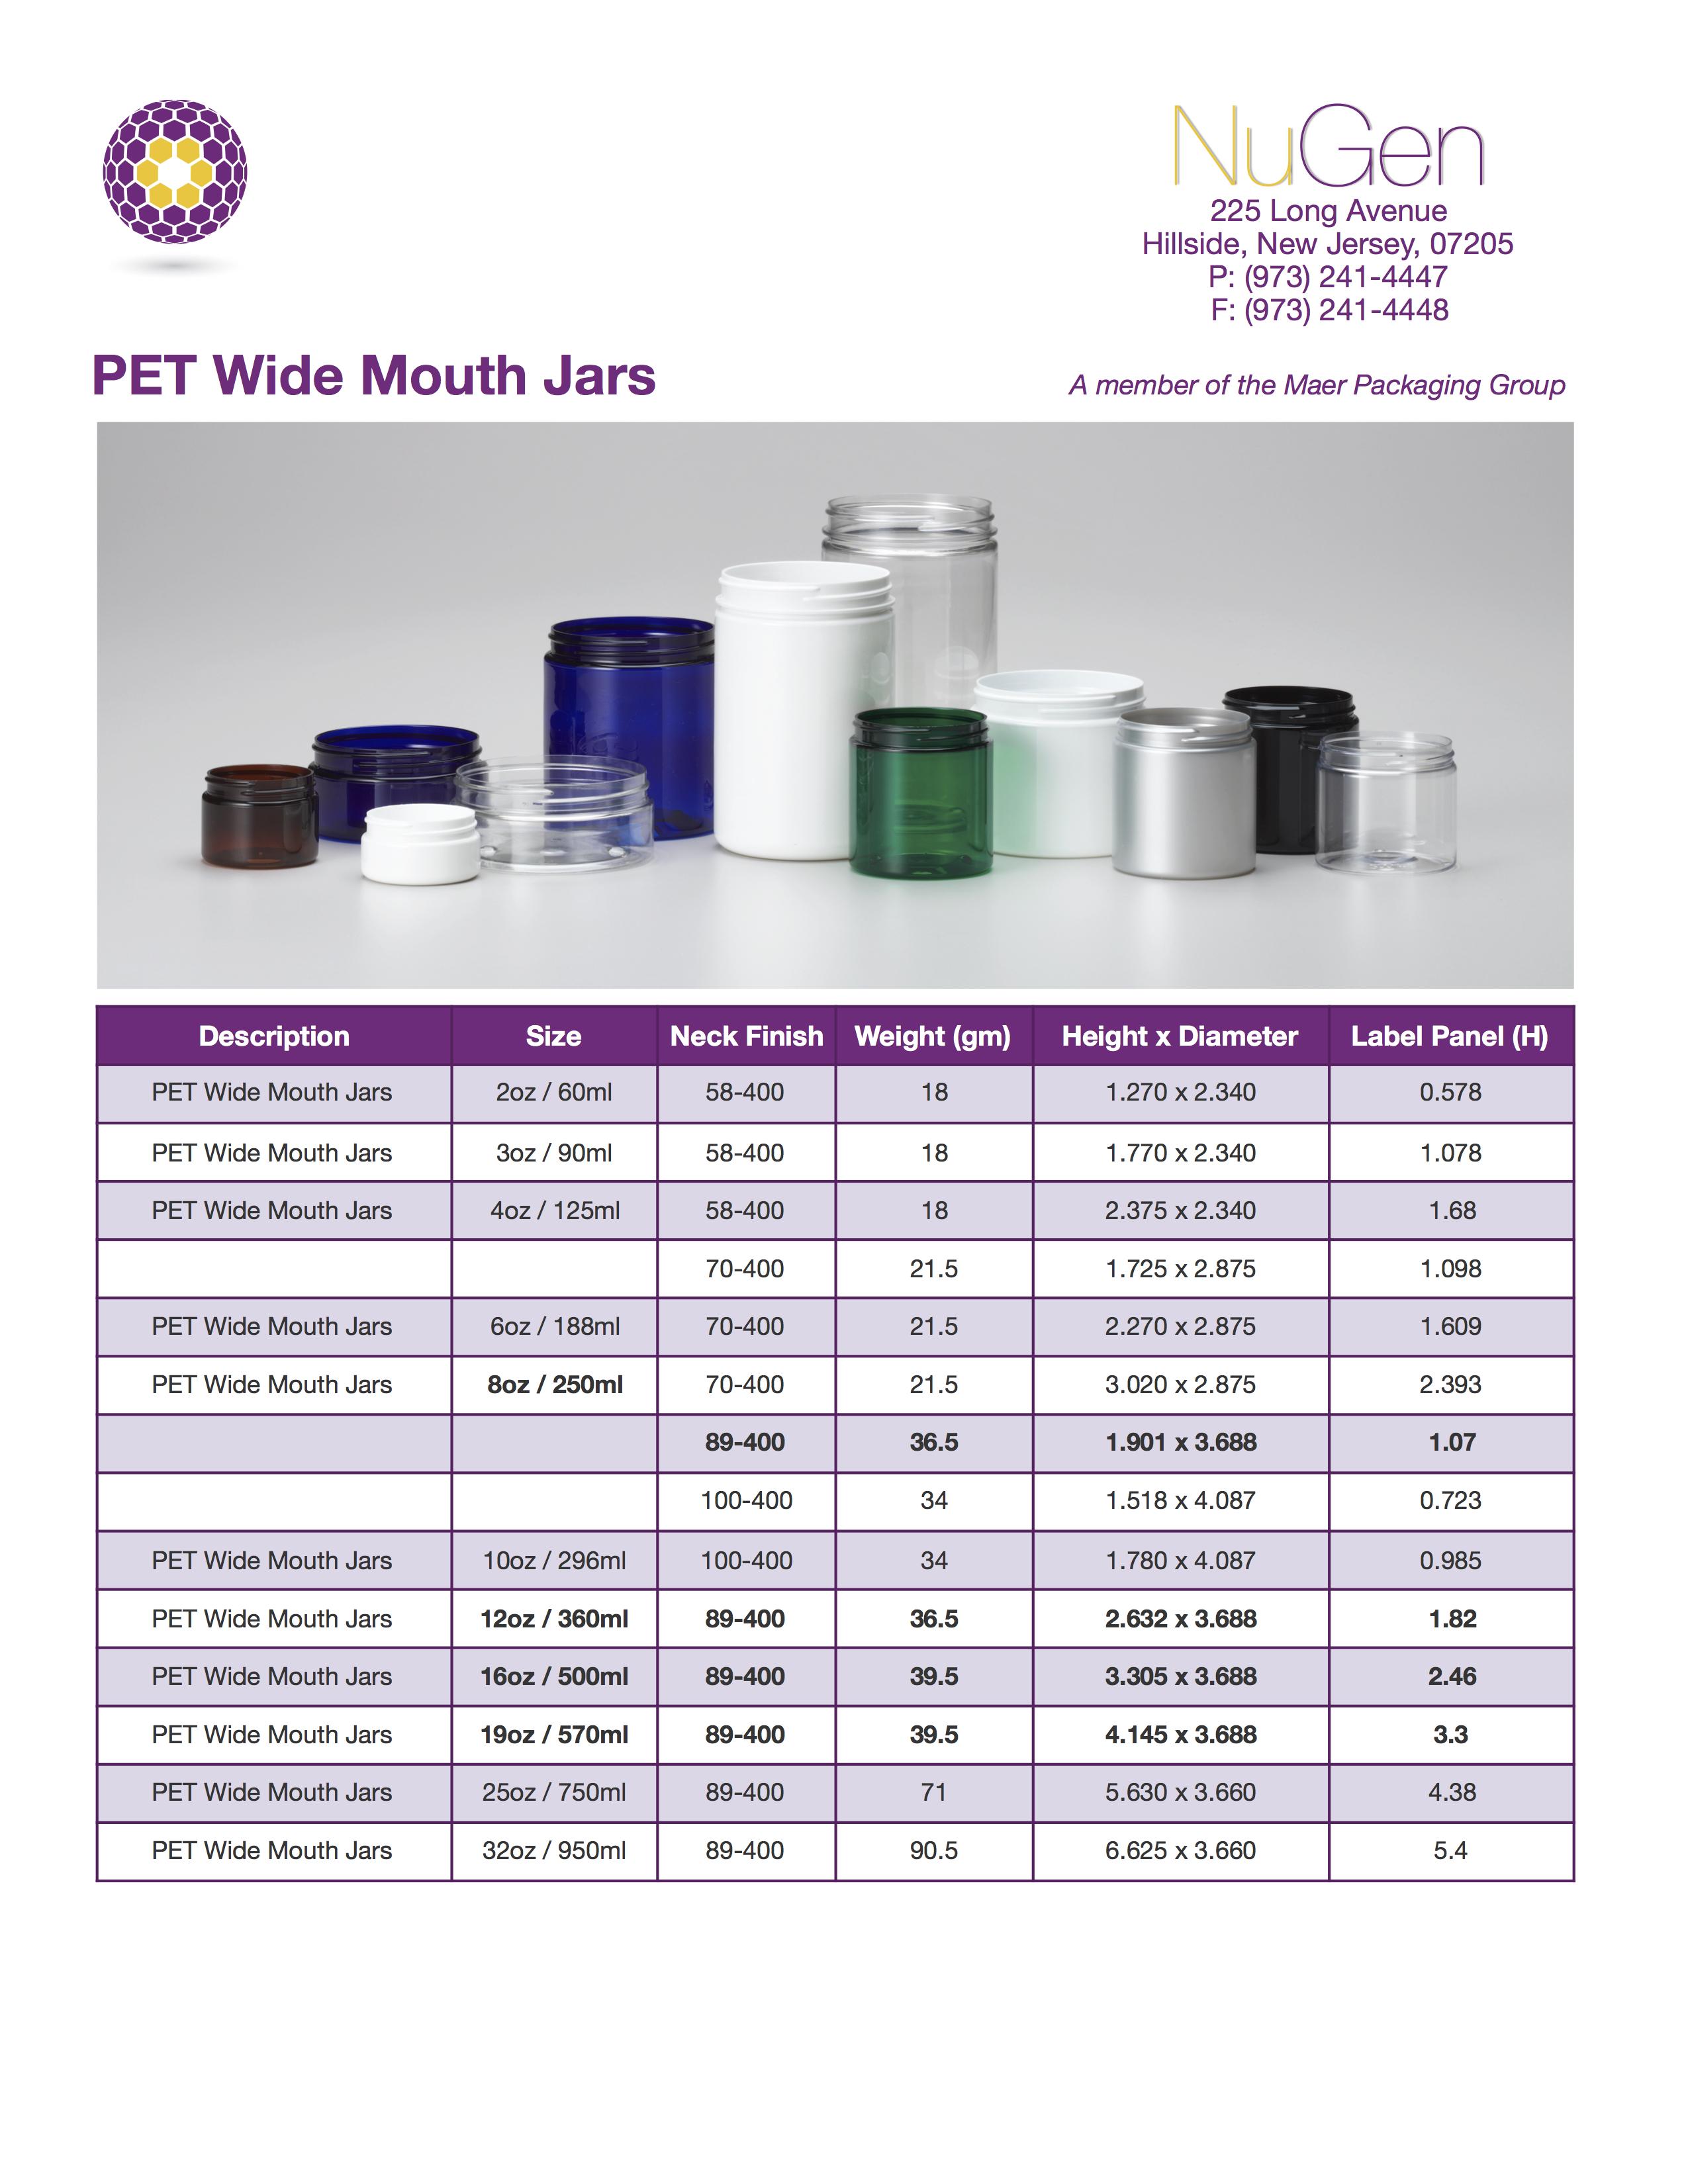 PETWideMouthJars-4-4-2016.jpg